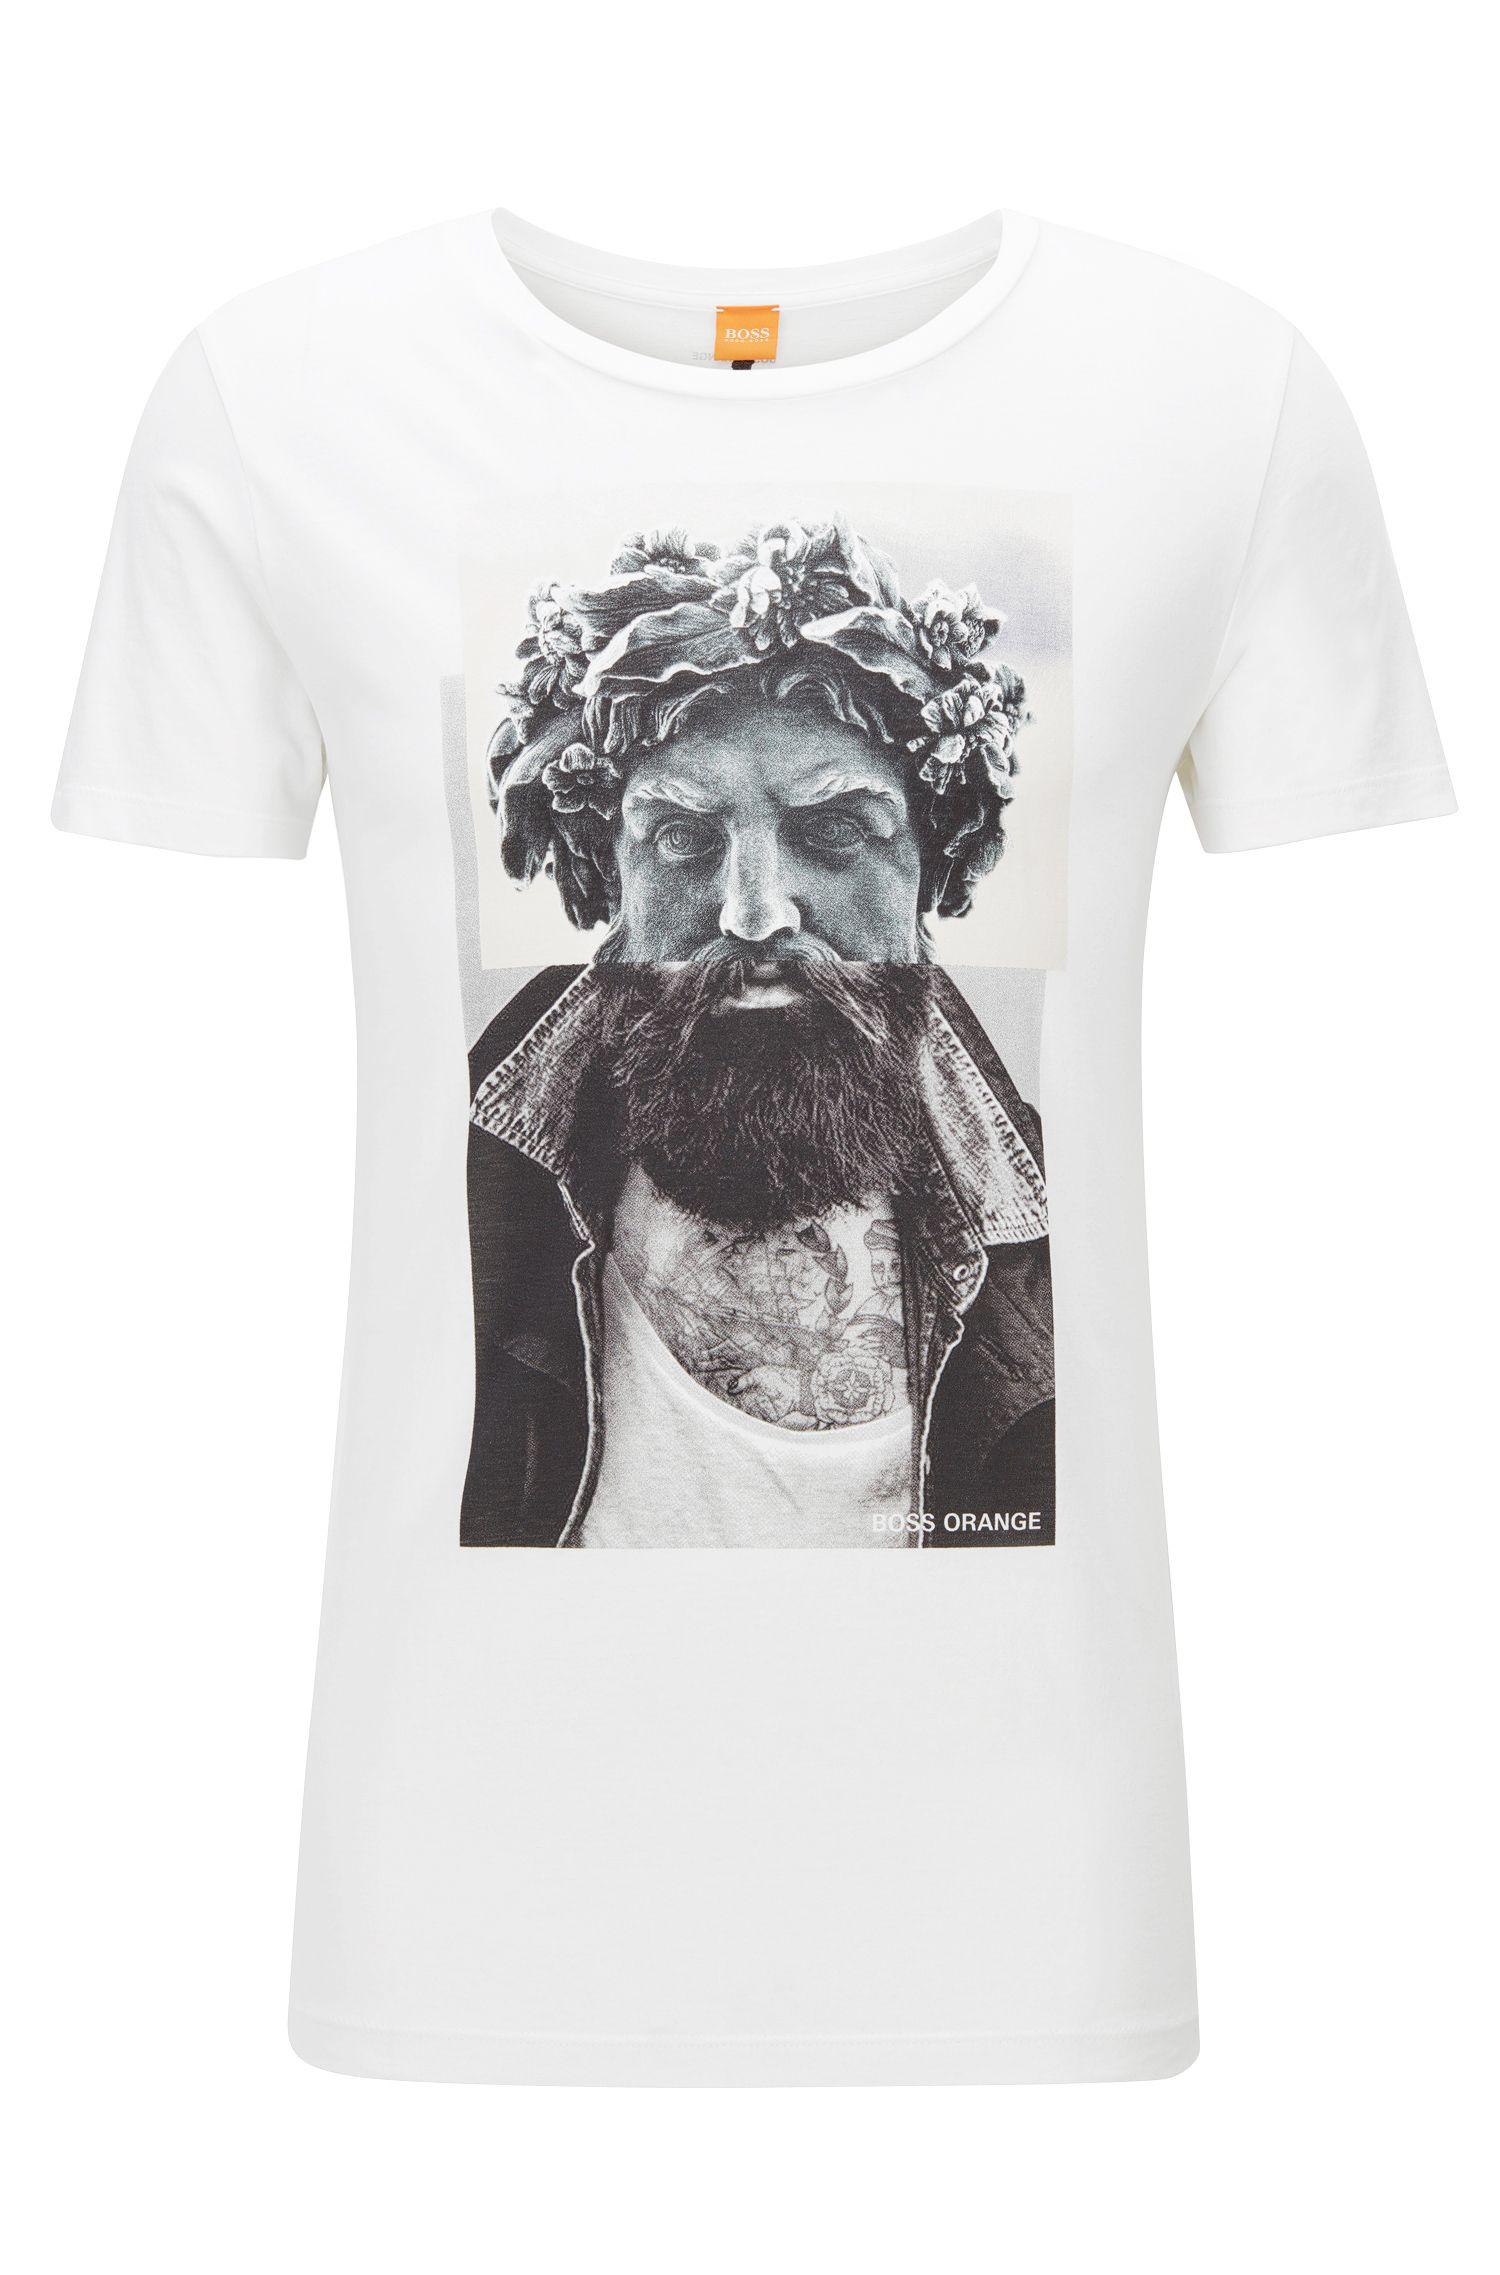 Digital-print cotton T-shirt in a regular fit